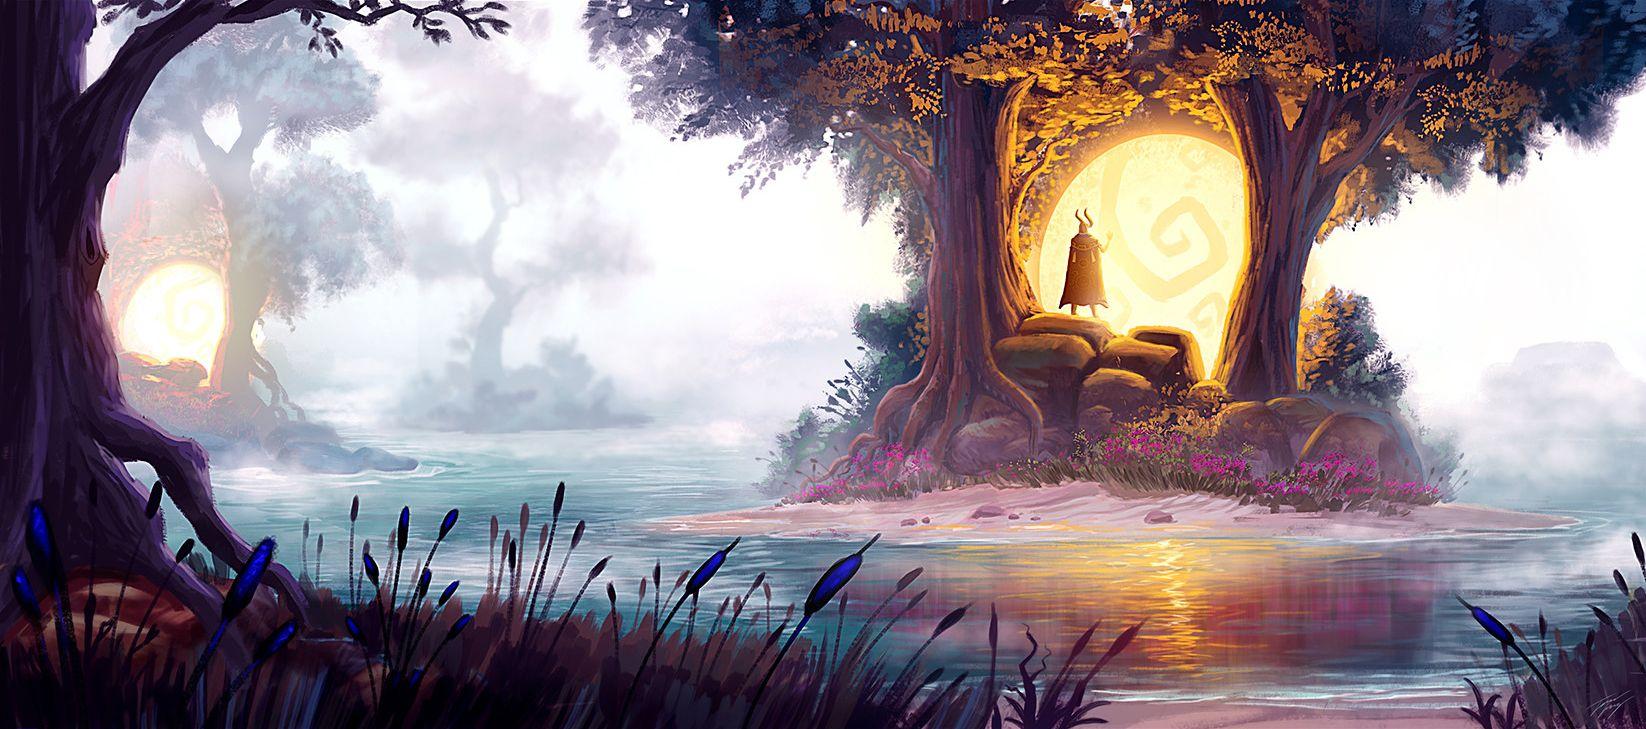 ArtStation - Gaia orbs, Travis Lacey | Fantasy landscape, Fantasy art landscapes, Digital art fantasy